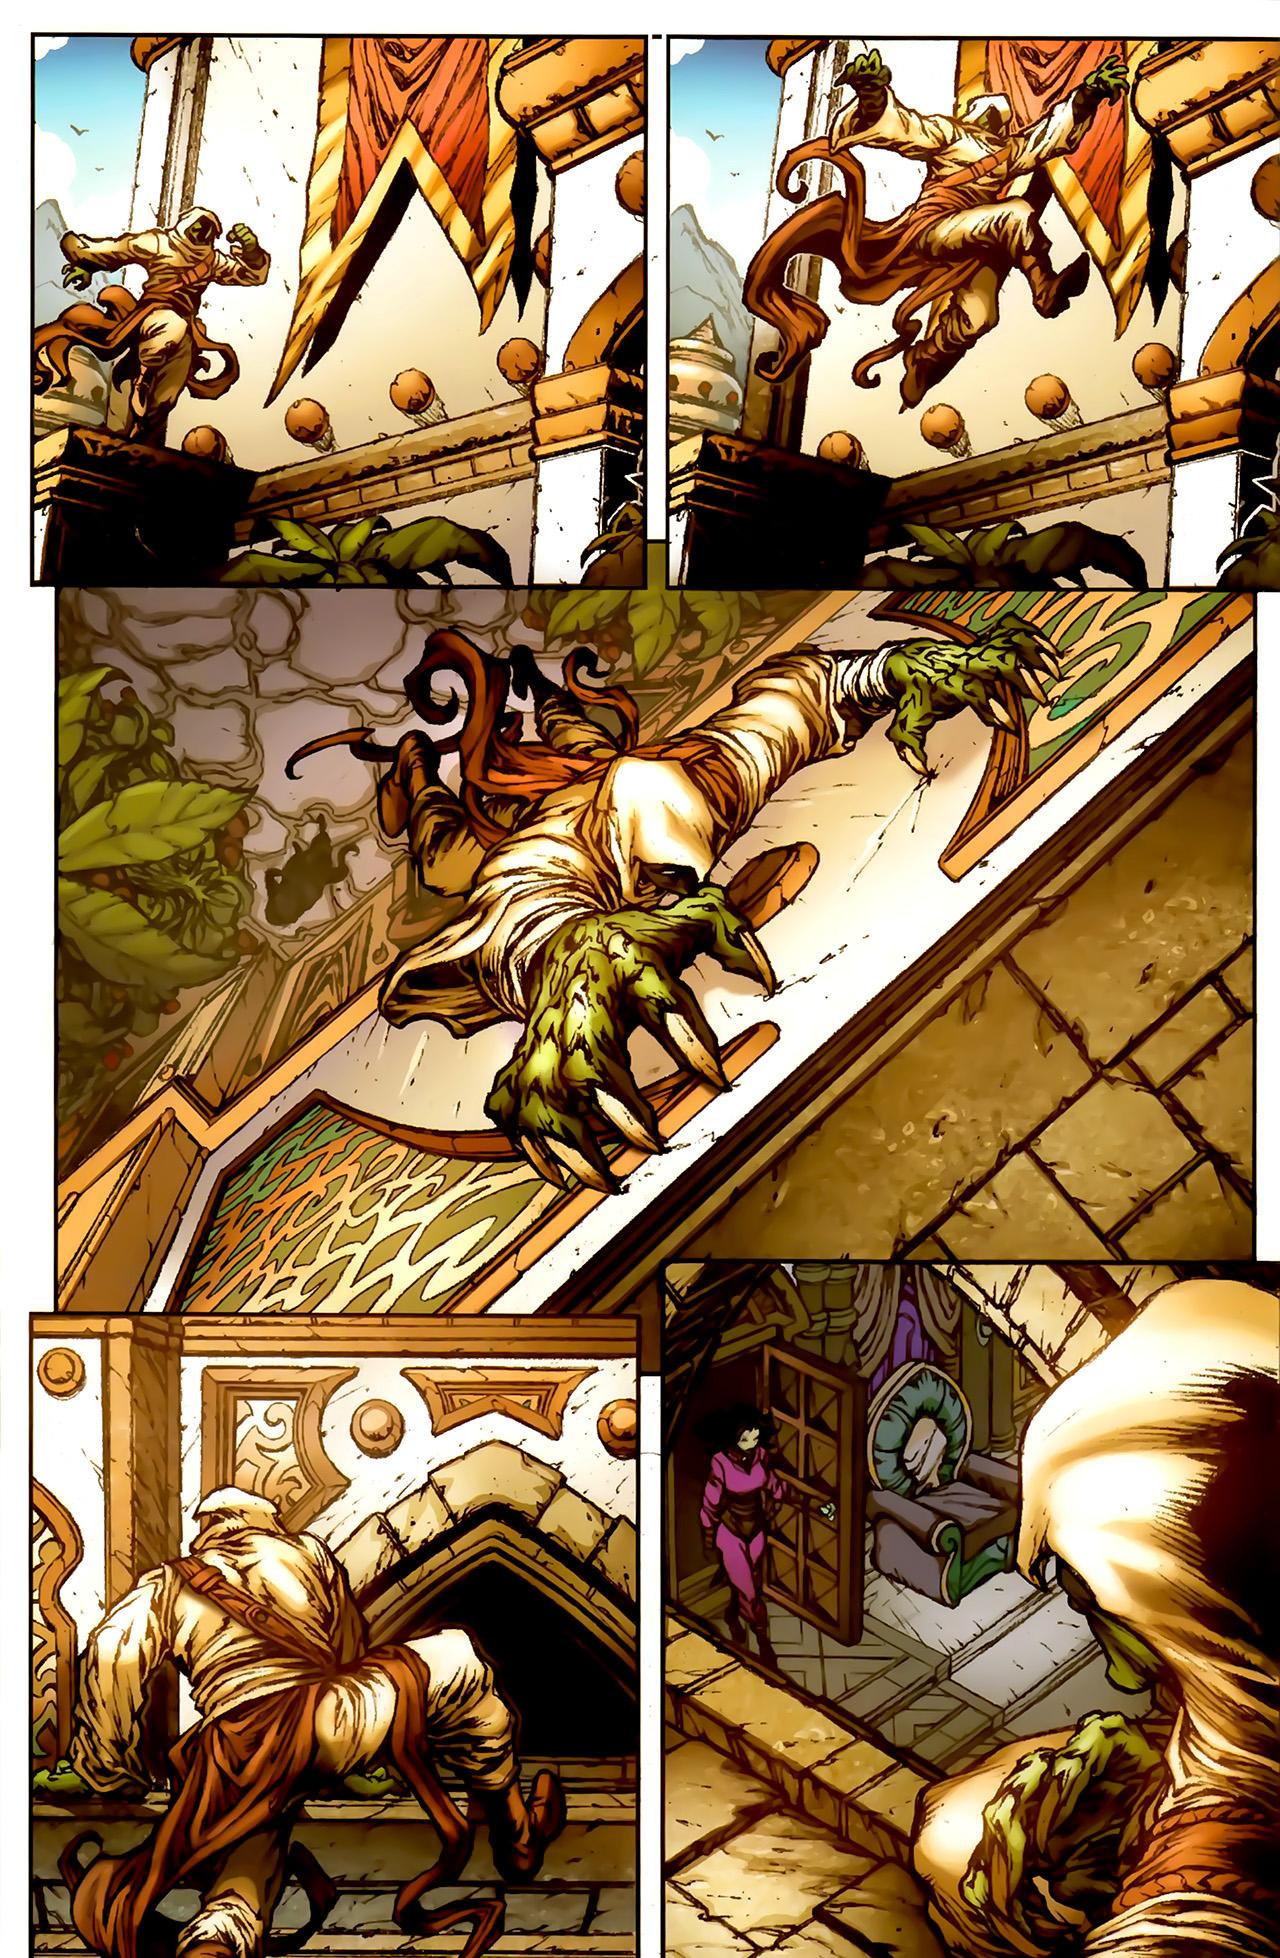 Read online 1001 Arabian Nights: The Adventures of Sinbad comic -  Issue #1 - 17